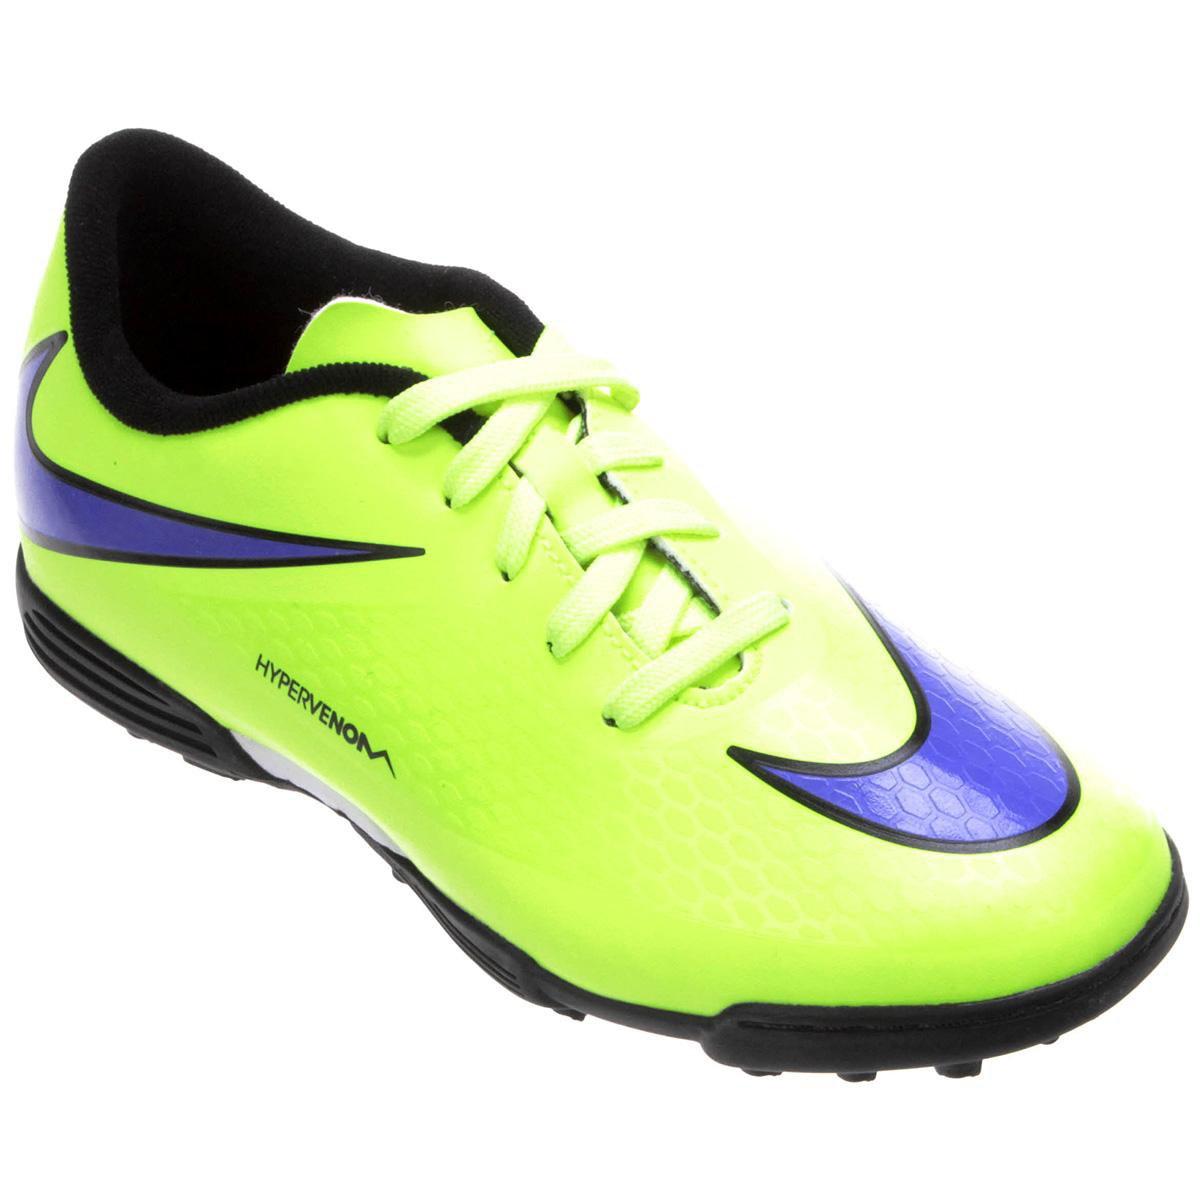 Chuteira Nike Hypervenom Phade TF Juvenil - Compre Agora  b92a65fc9348c